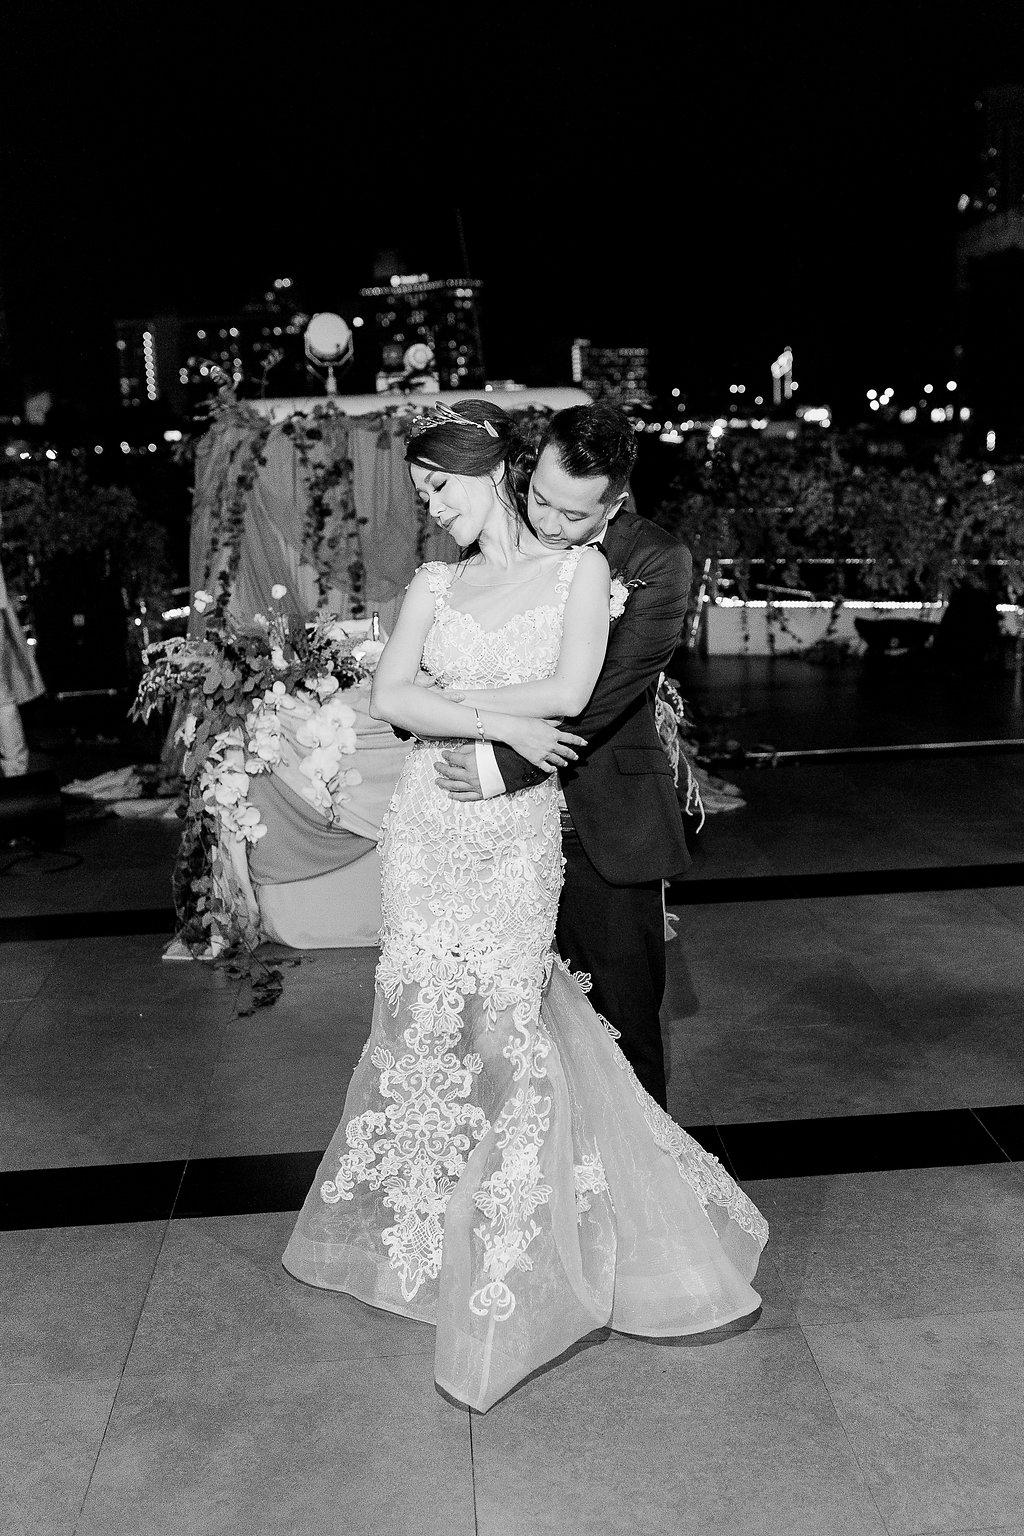 Luxe destination wedding in Jakarta and Bankok | fine art film wedding photographer Tanja Kibogo 4008.JPG